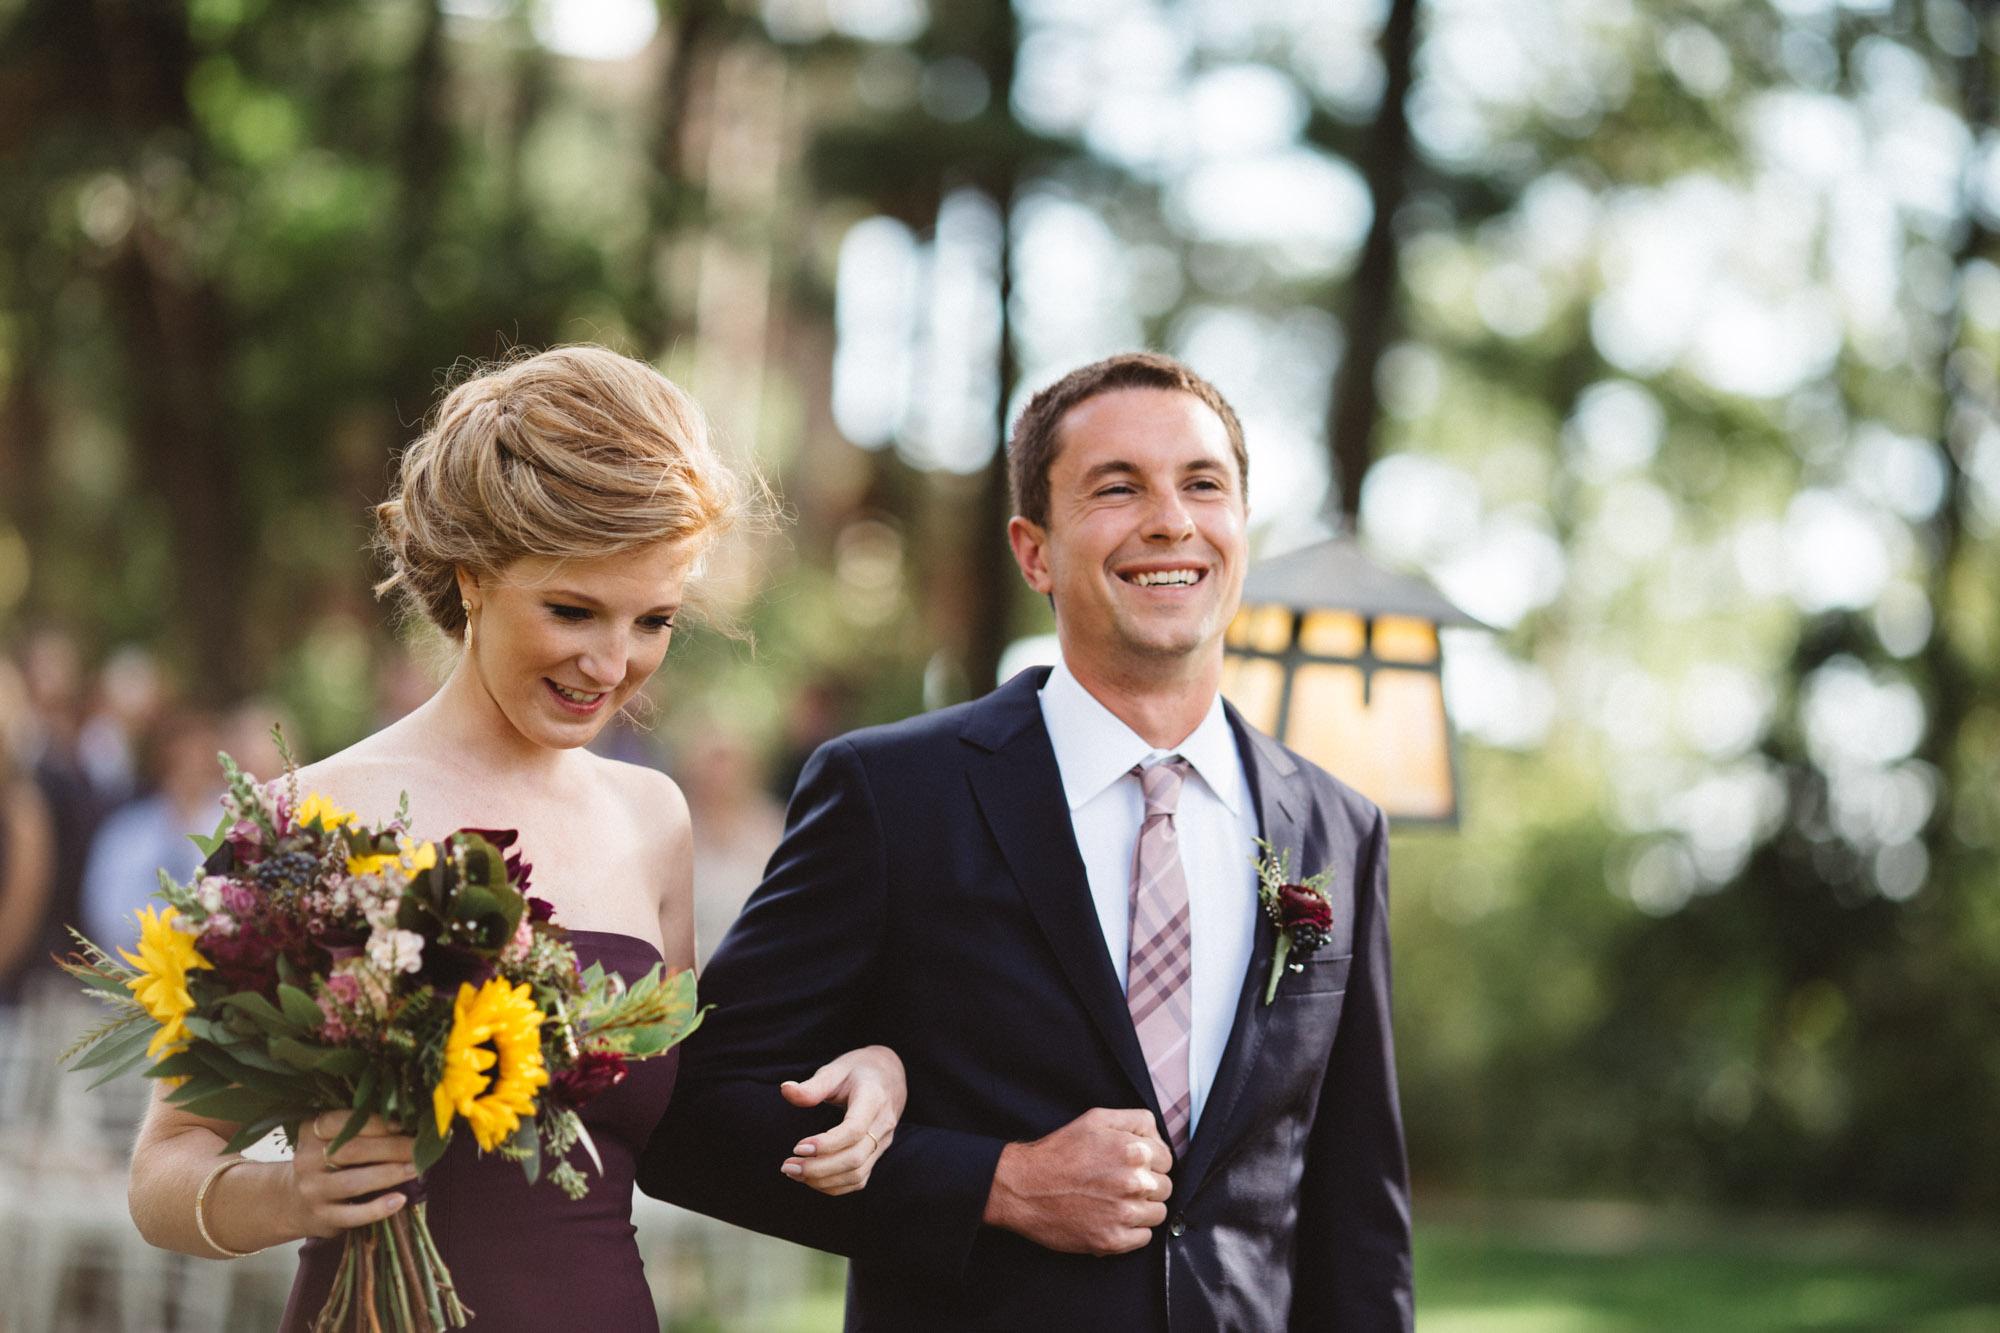 Grand View Lodge wedding photography by Britt DeZeeuw, Brainerd MN photographer